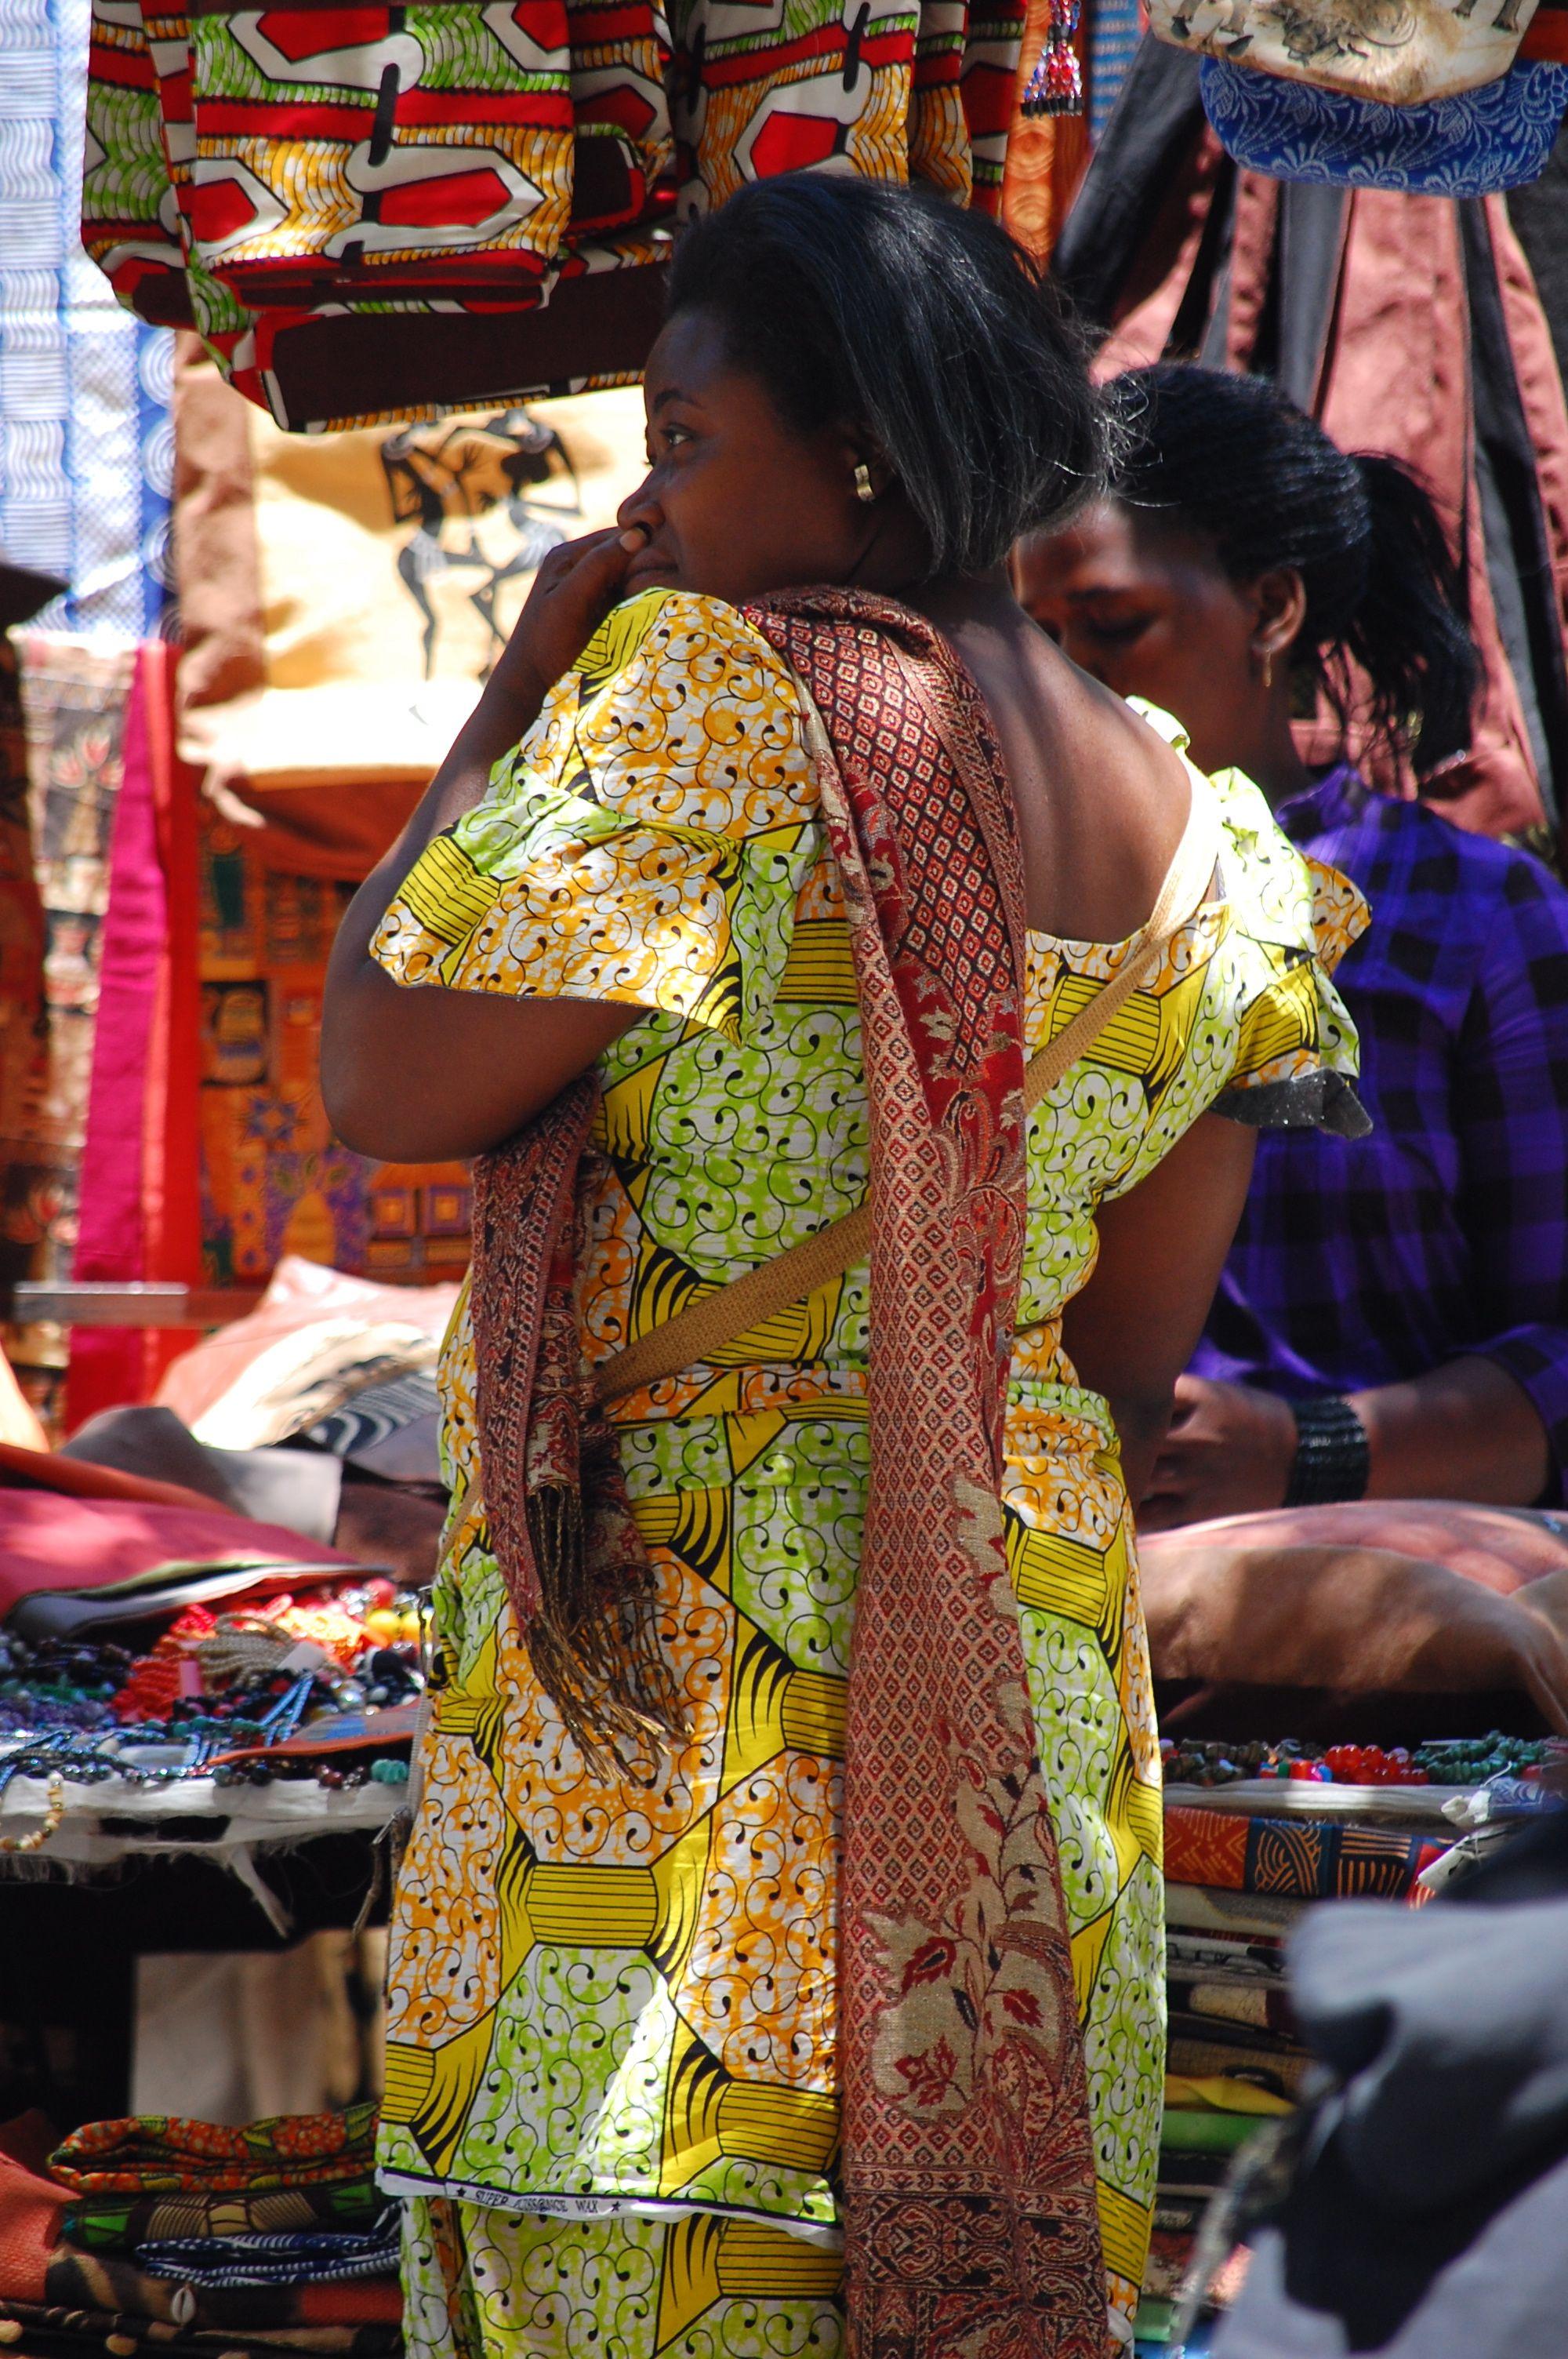 Long Street Outdoor Markets Capetown South Africa